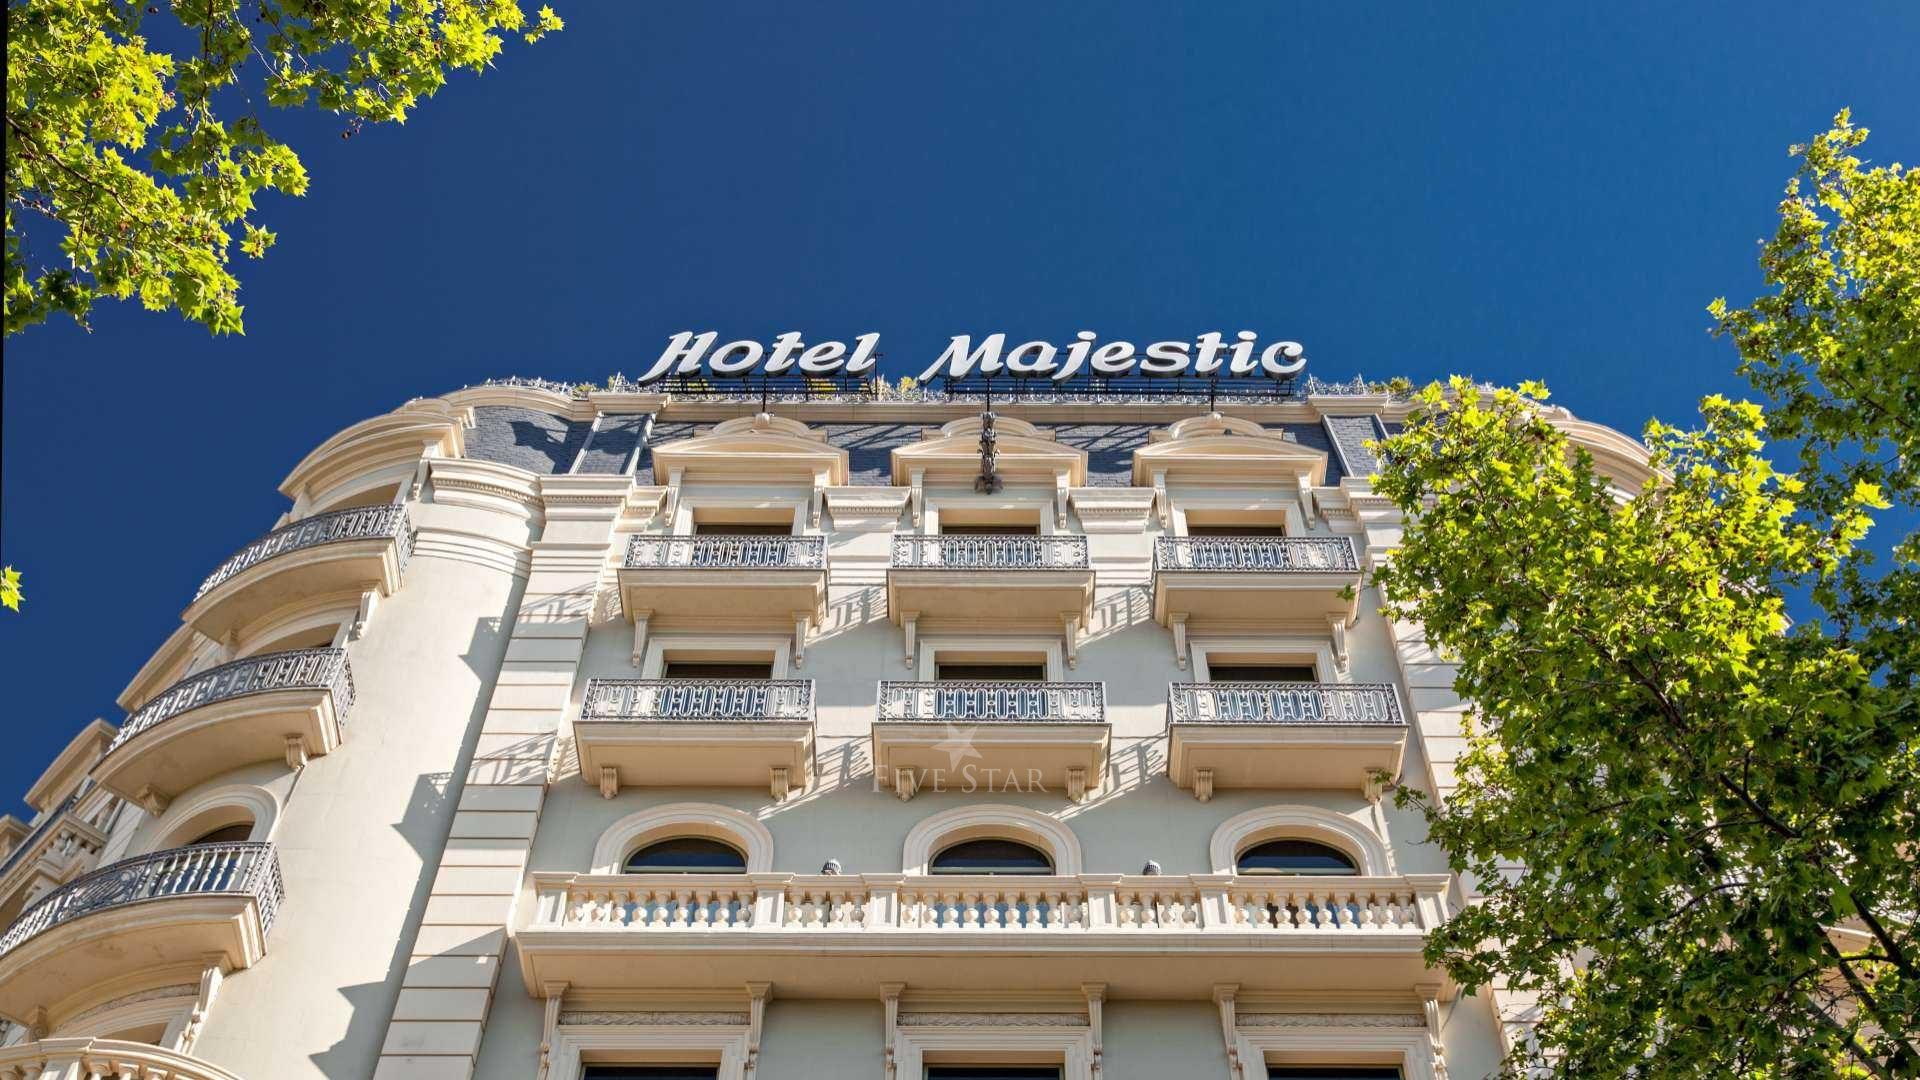 Majestic Hotel photo 2